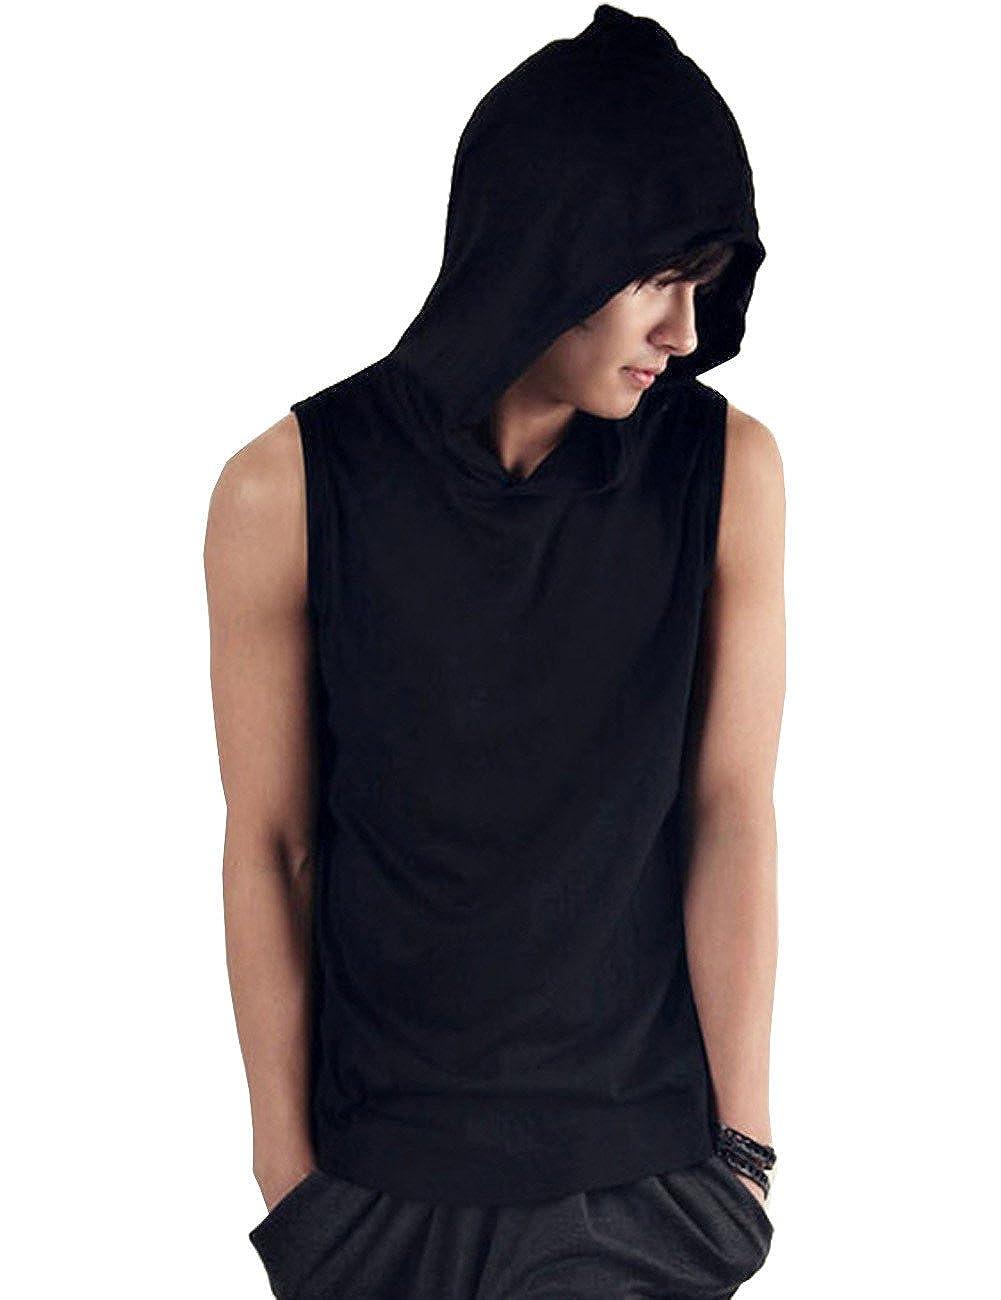 Yollmart Mens Casual Hooded Sleeveless Tank Tops Vest Black